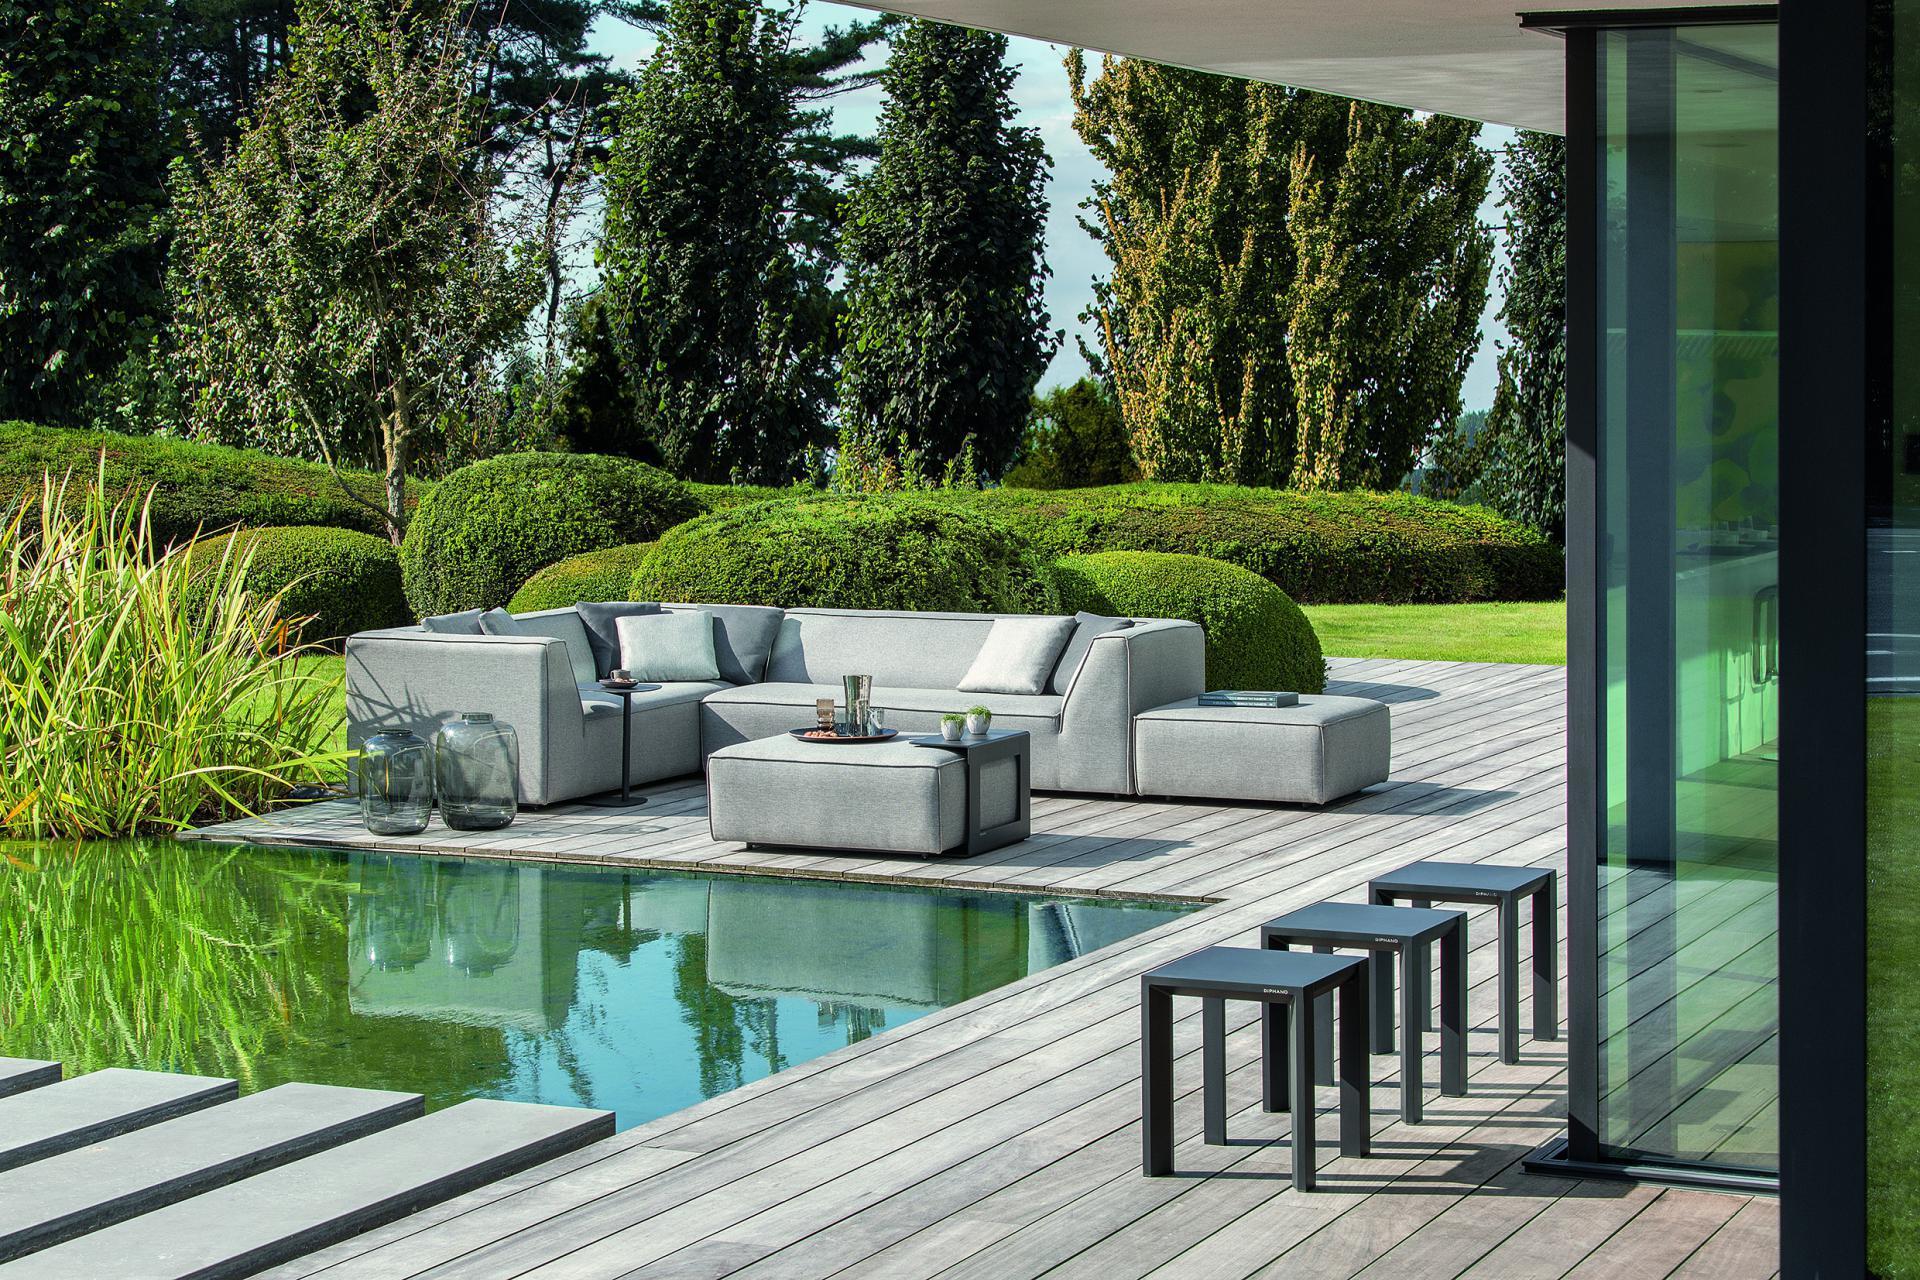 Buitensalon, outdoor lounge met weerbestendige bekleding